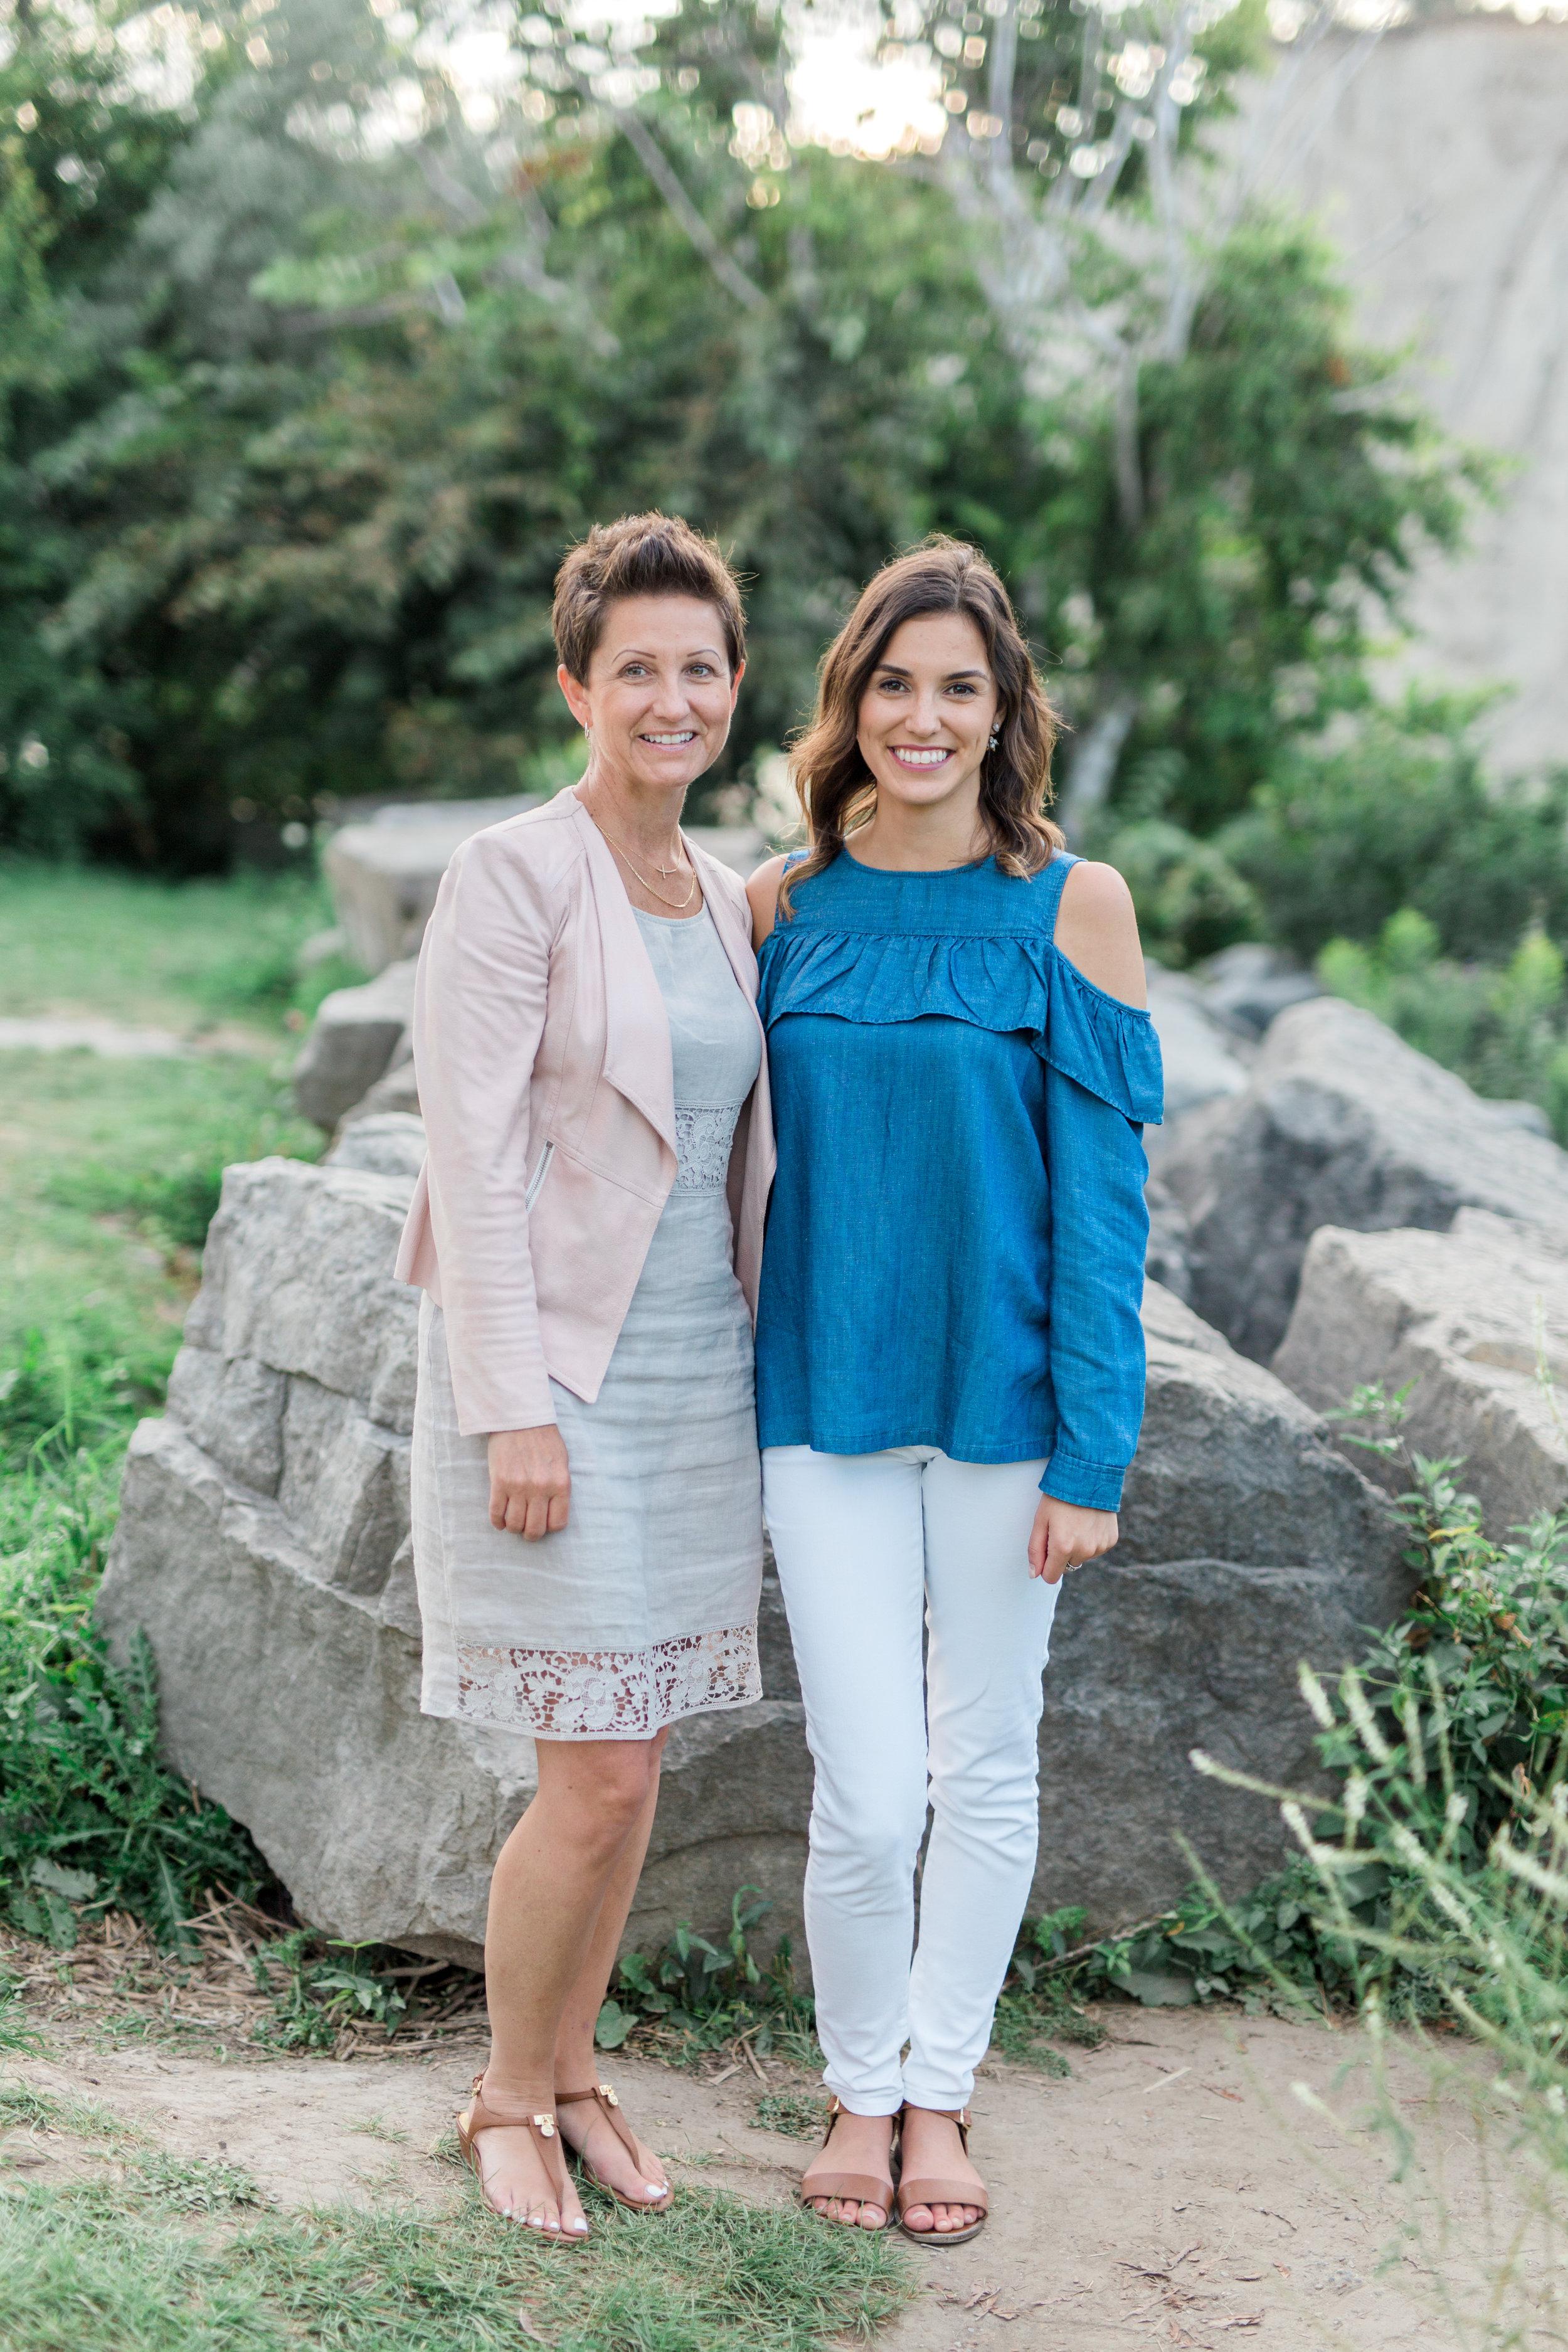 Danielle-Giroux-Amir-Golbazi-Genua-Family-Photography-Scarborough-Bluffs-9190.jpg